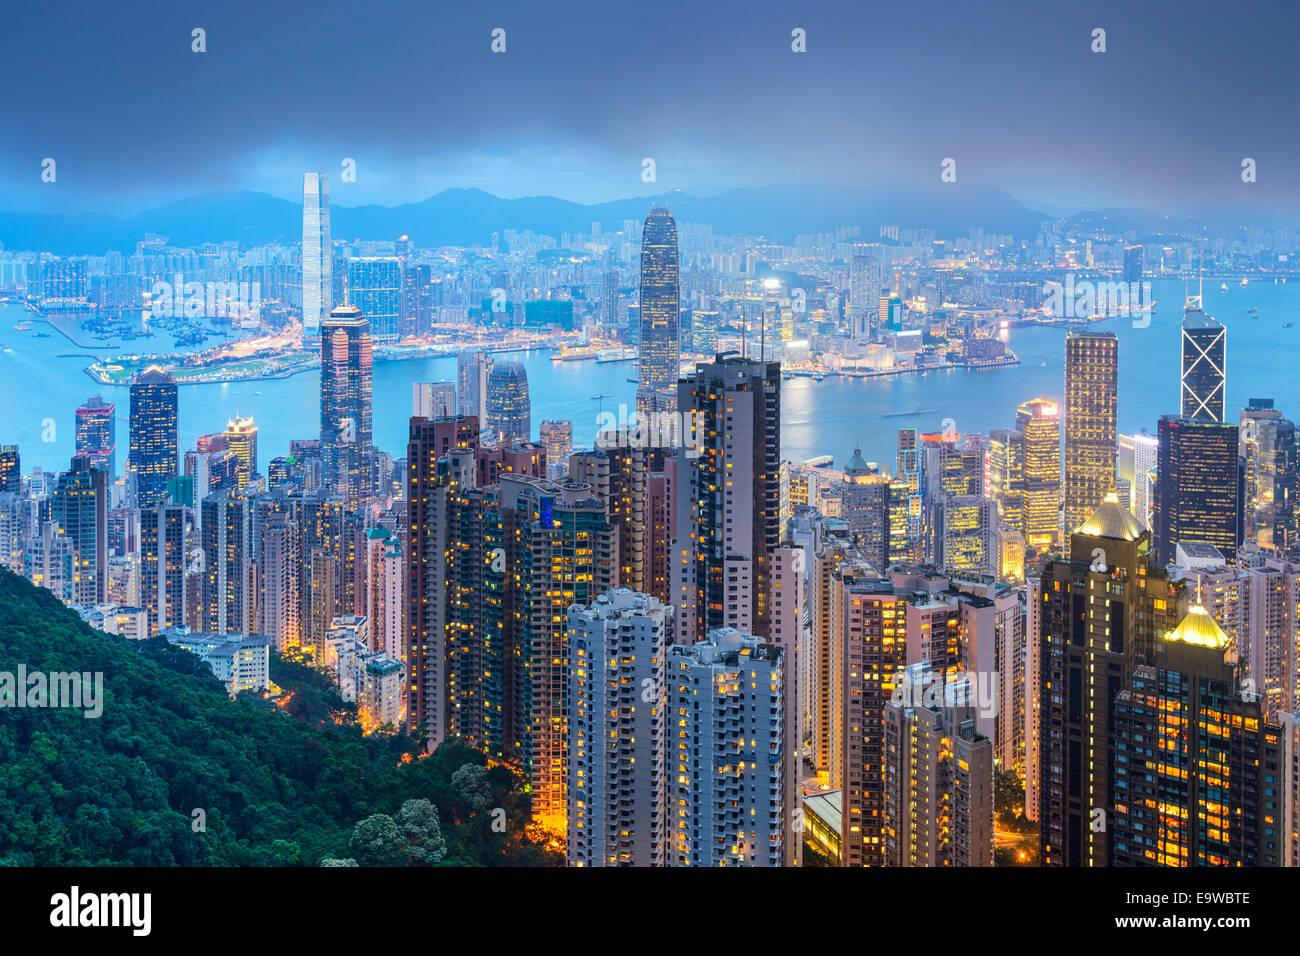 Hong Kong, China city skyline from the Peak. - Stock Image